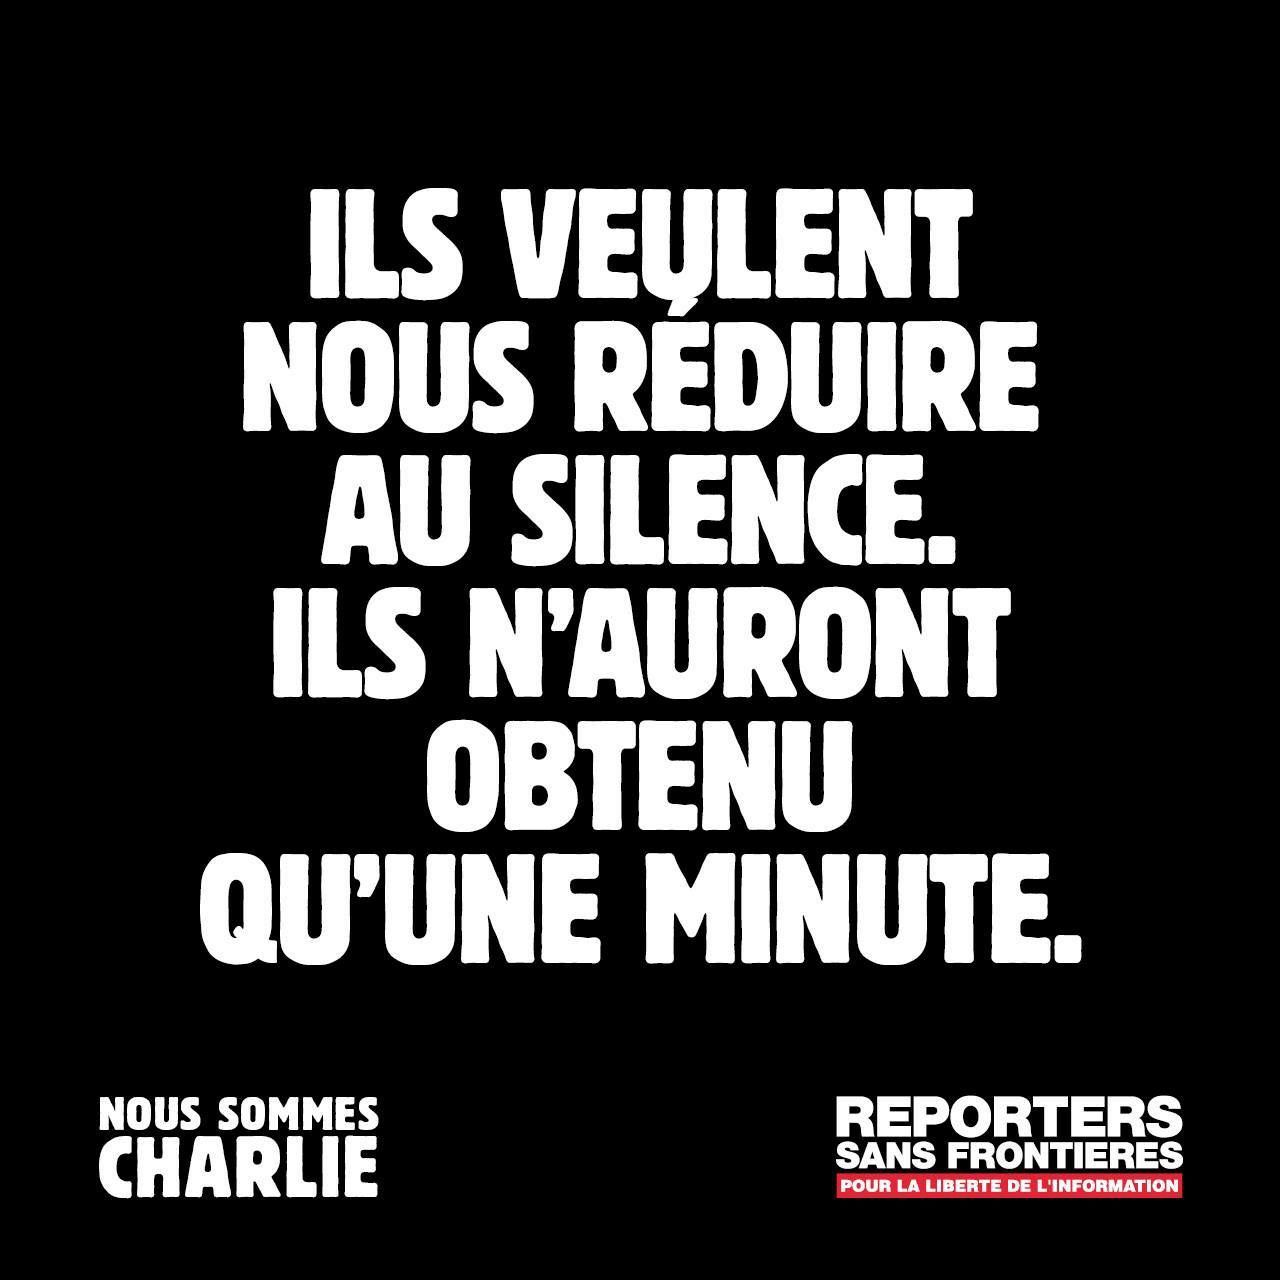 Charlie #jesuischarlie #CharlieHebdov